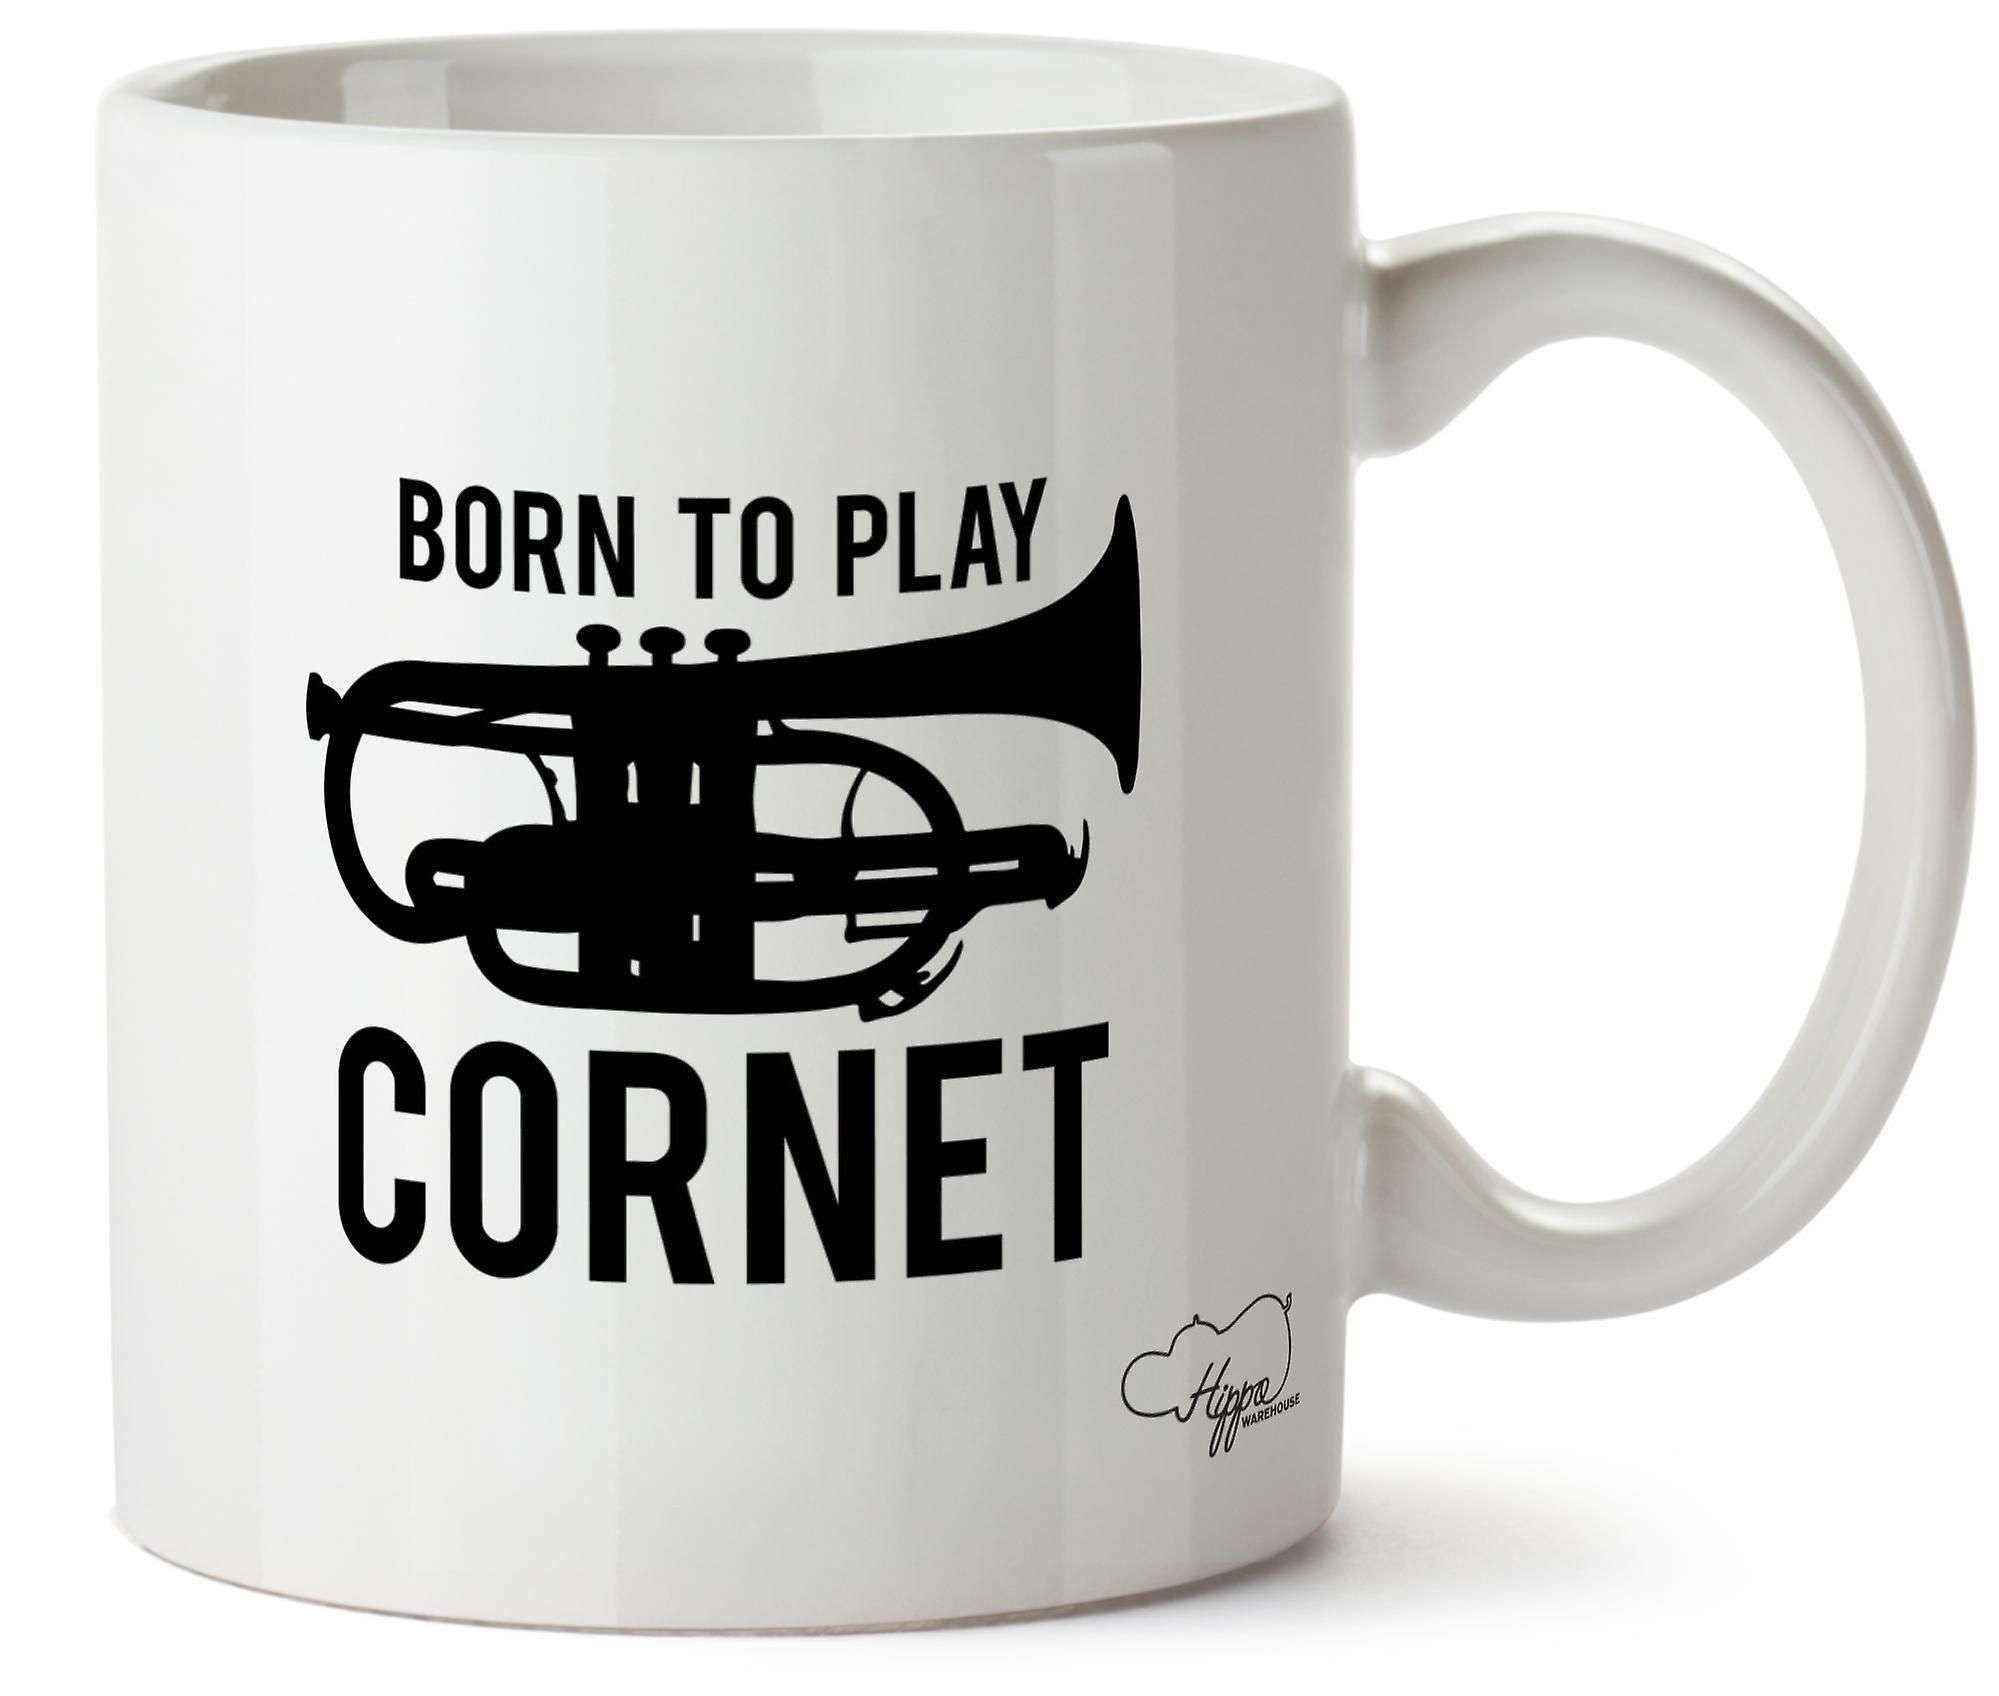 Born Céramique Tasse Cornet Hippowarehouse 10oz En To Play Imprimé 8XOn0wPk